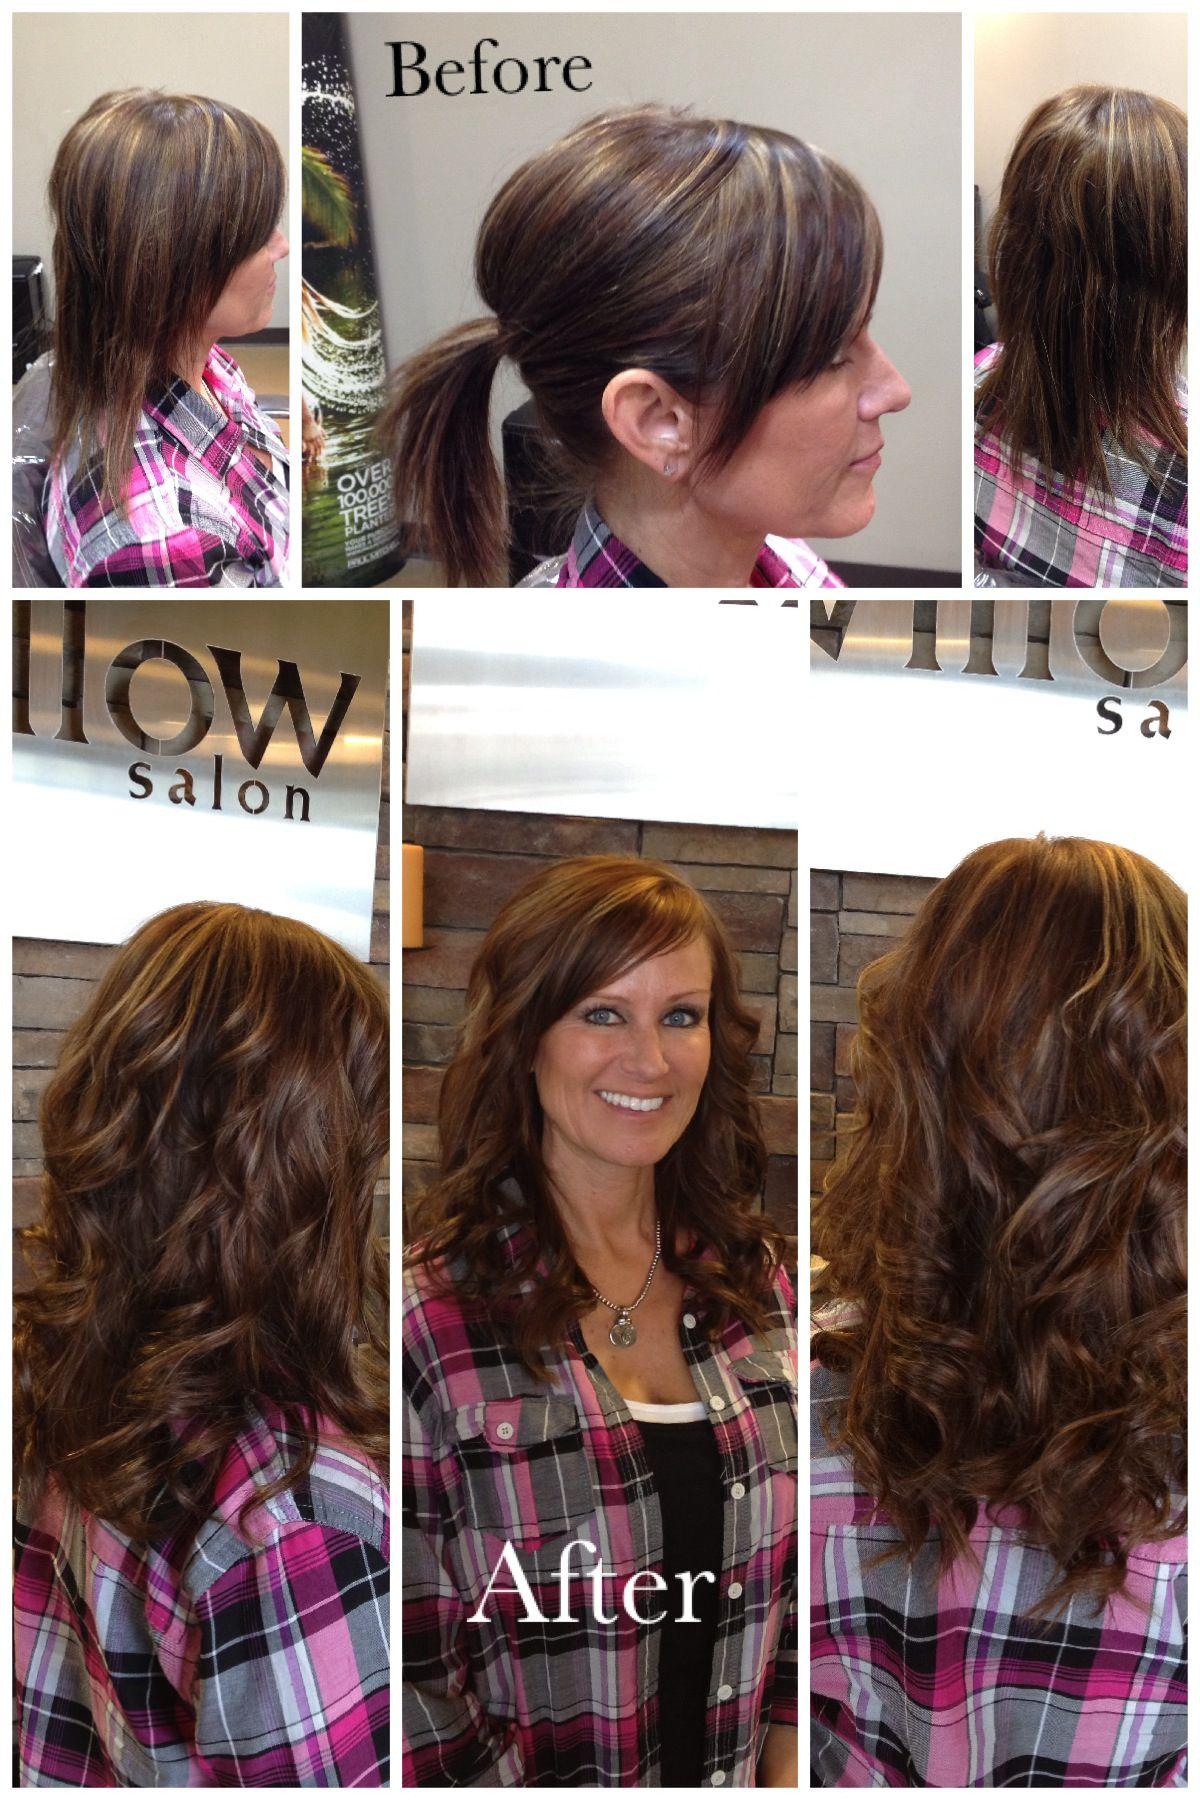 Willow Salon Maple Grove Mn Cool Hairstyles Hair Styles Hair